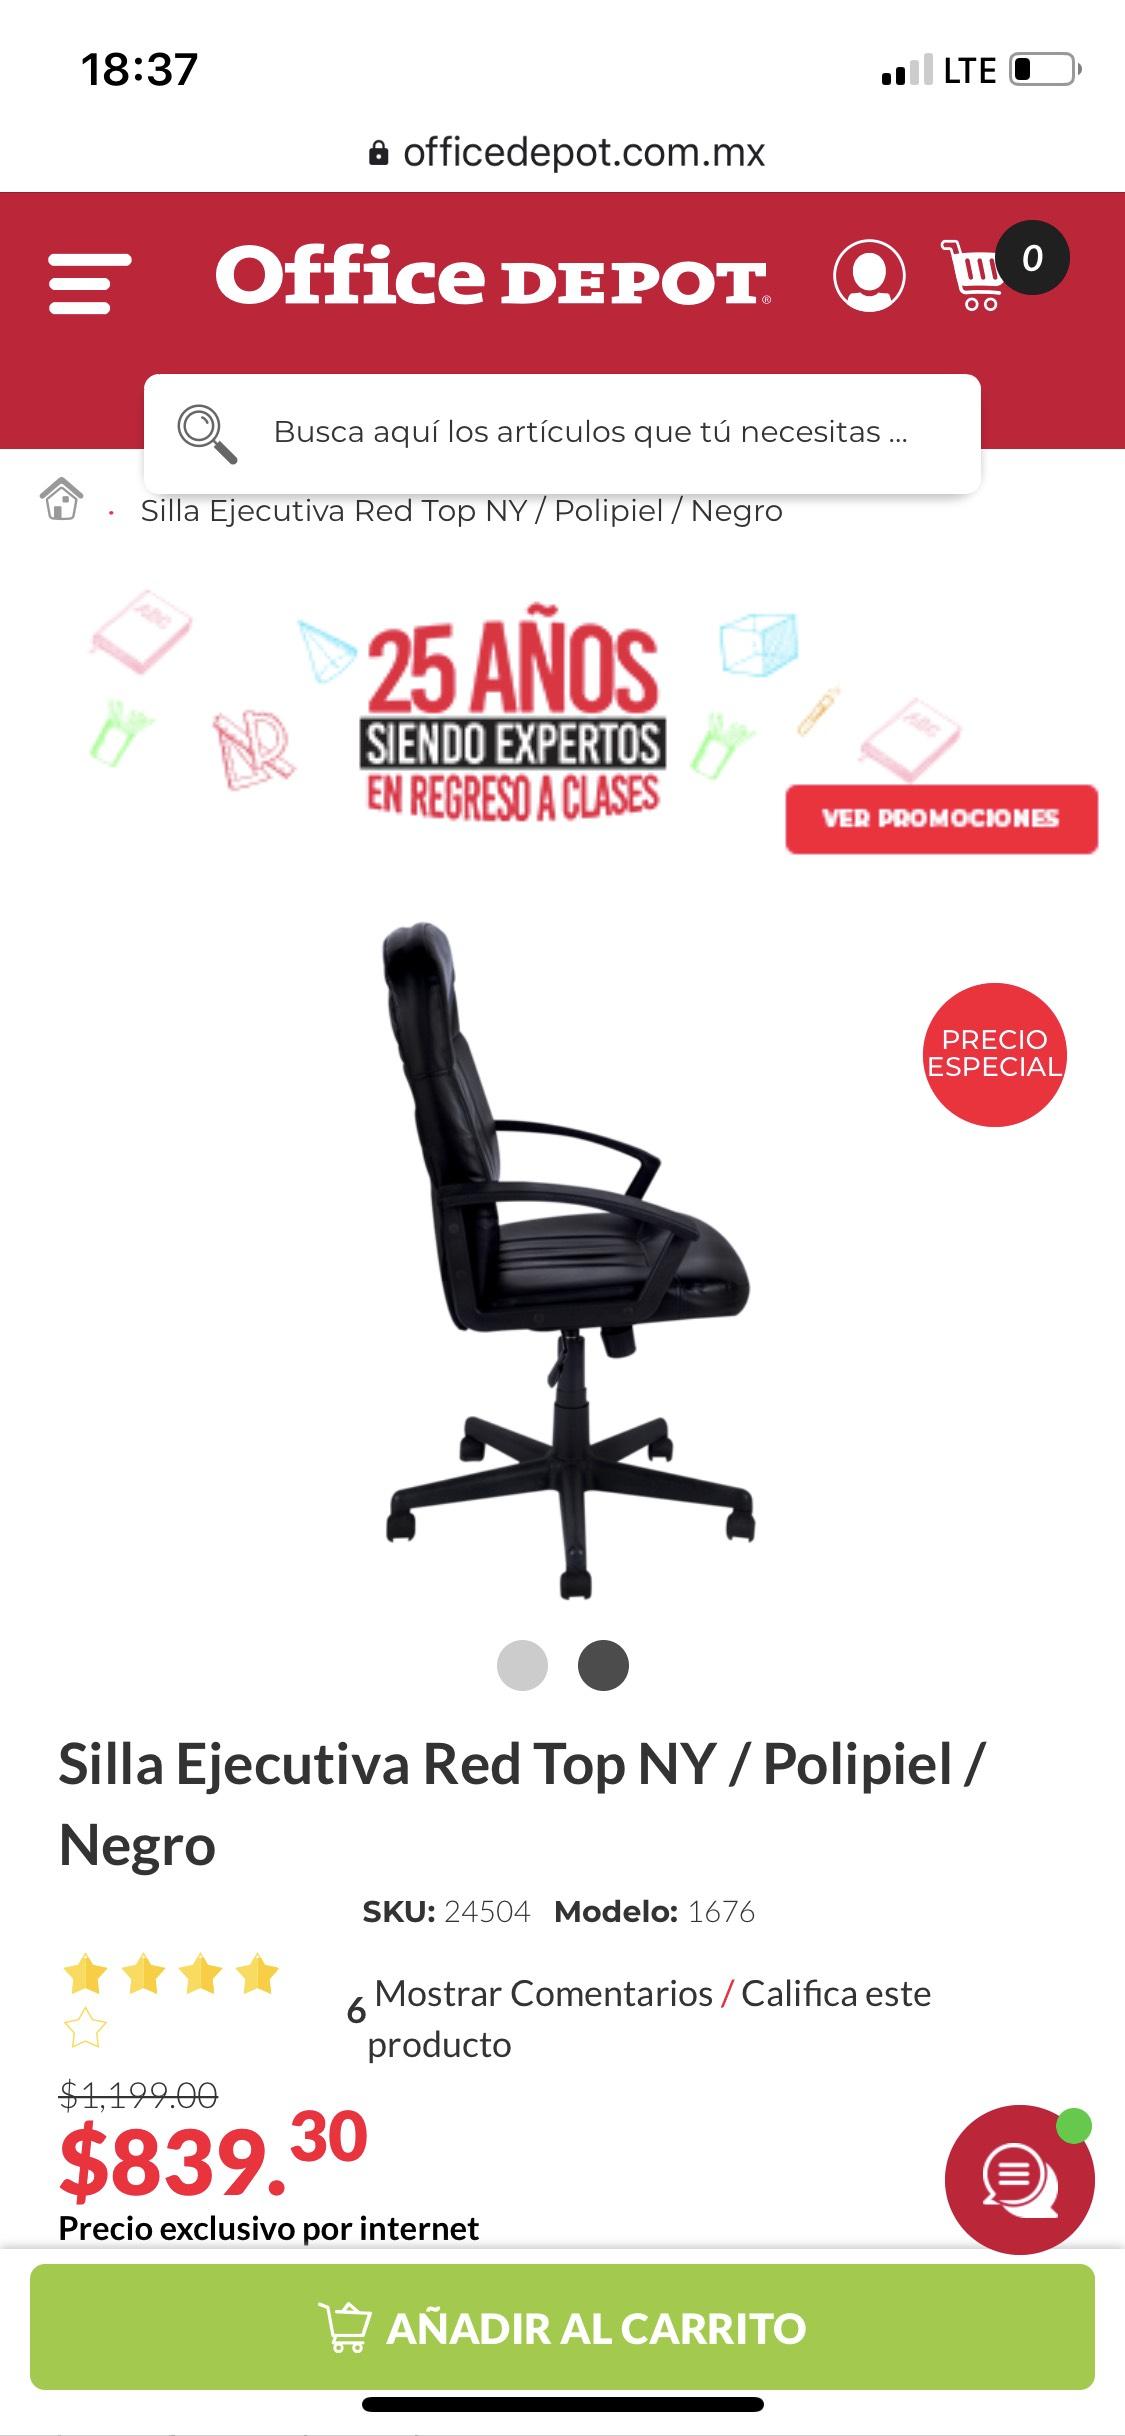 Office Depot: Silla Ejecutiva Red Top NY / Polipiel / Negro